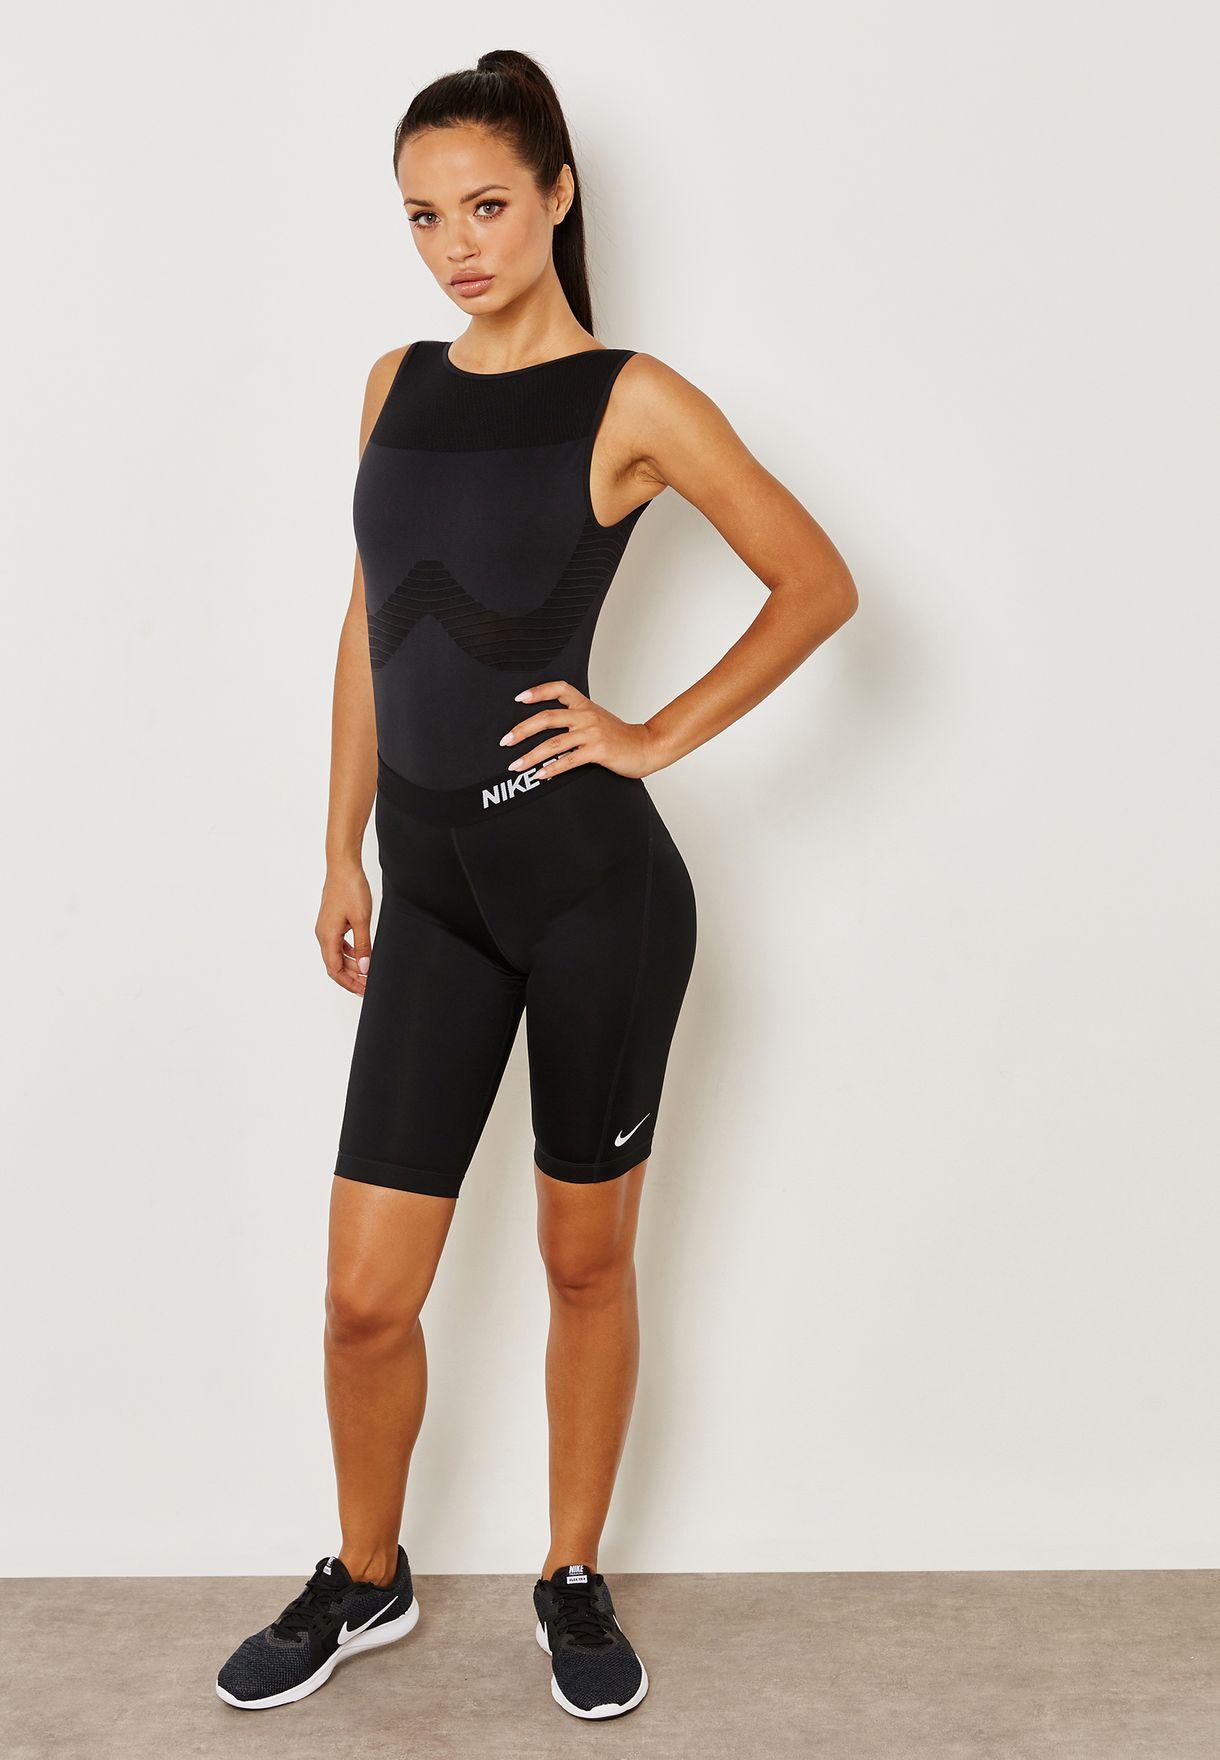 Profesor de escuela cortar Fuera  Buy Nike black Seamless Studio Bodysuit for Women in MENA, Worldwide |  890648-010